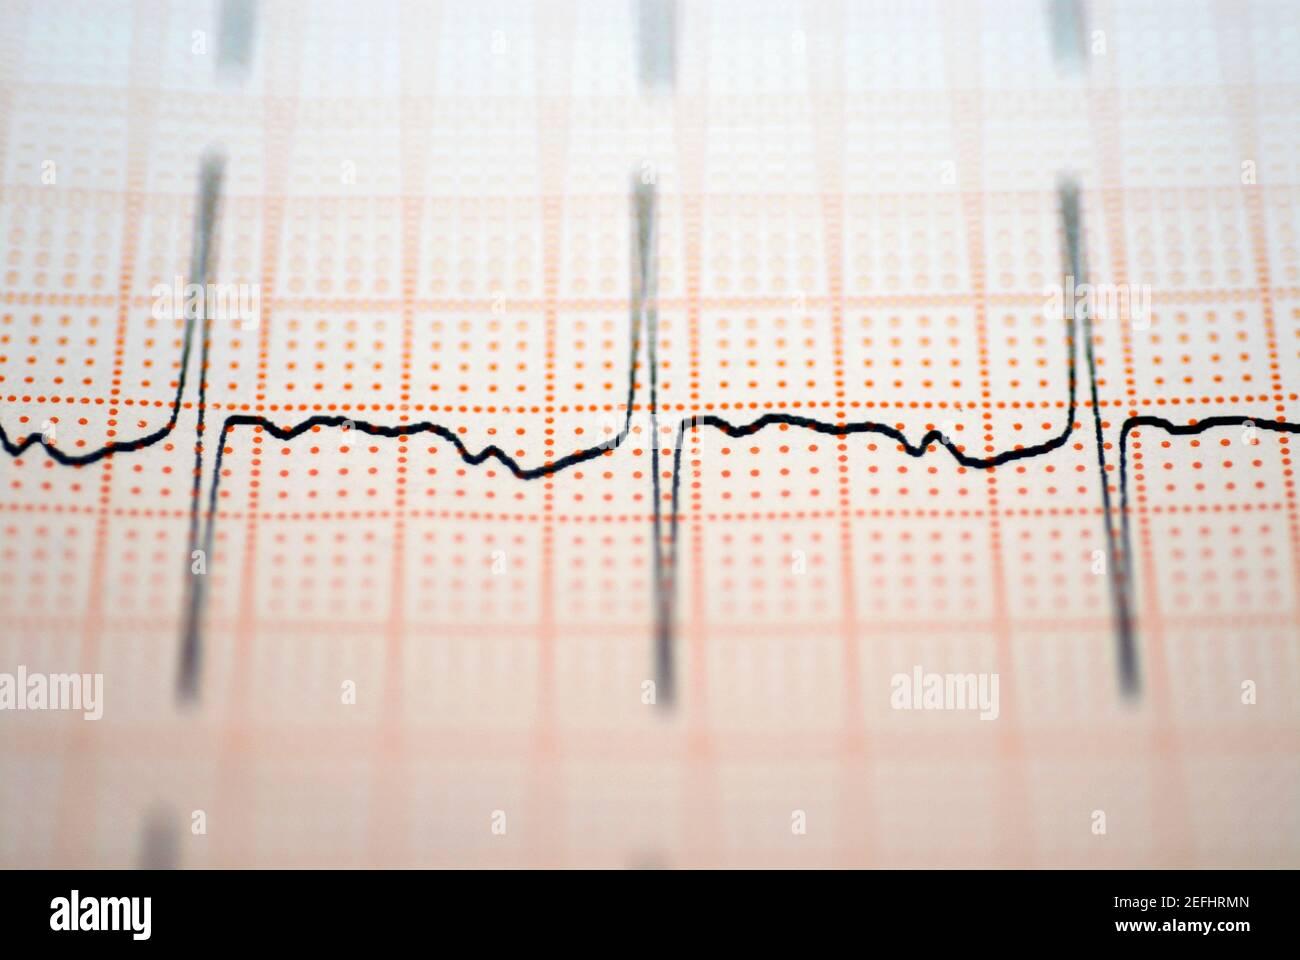 Close-up de un informe de ECG Foto de stock